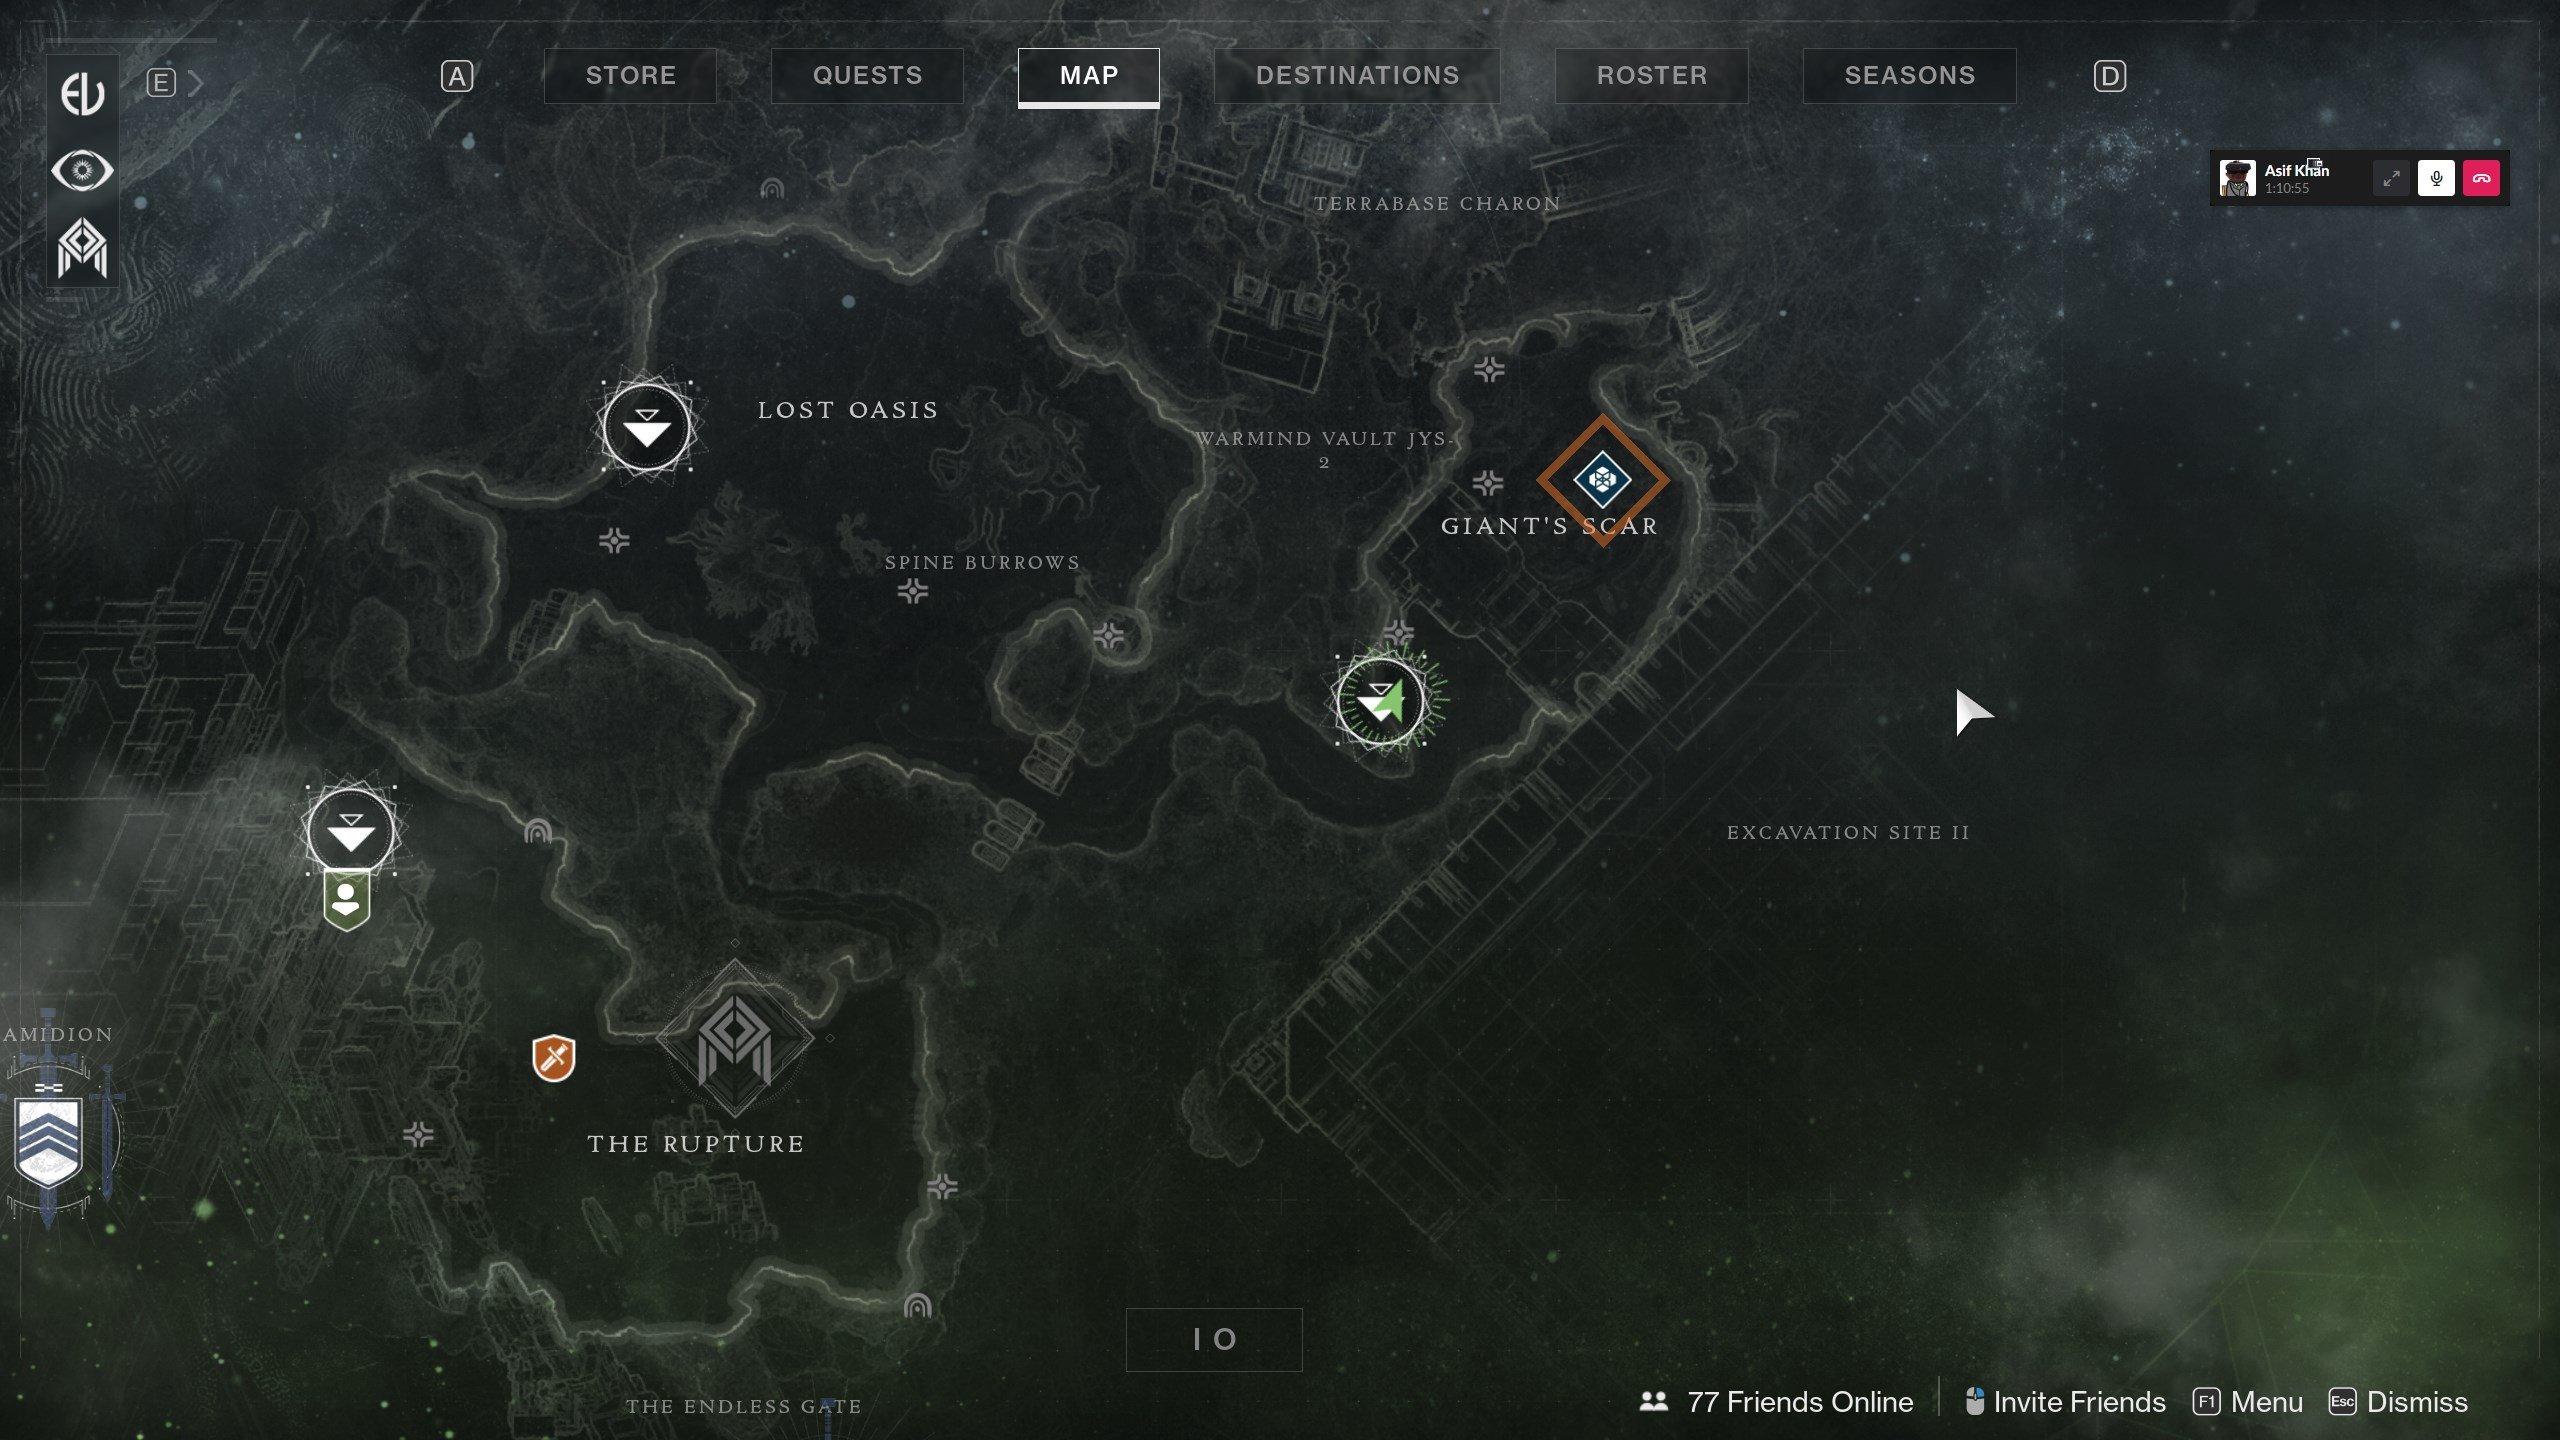 Destiny 2 - Xur location March 20